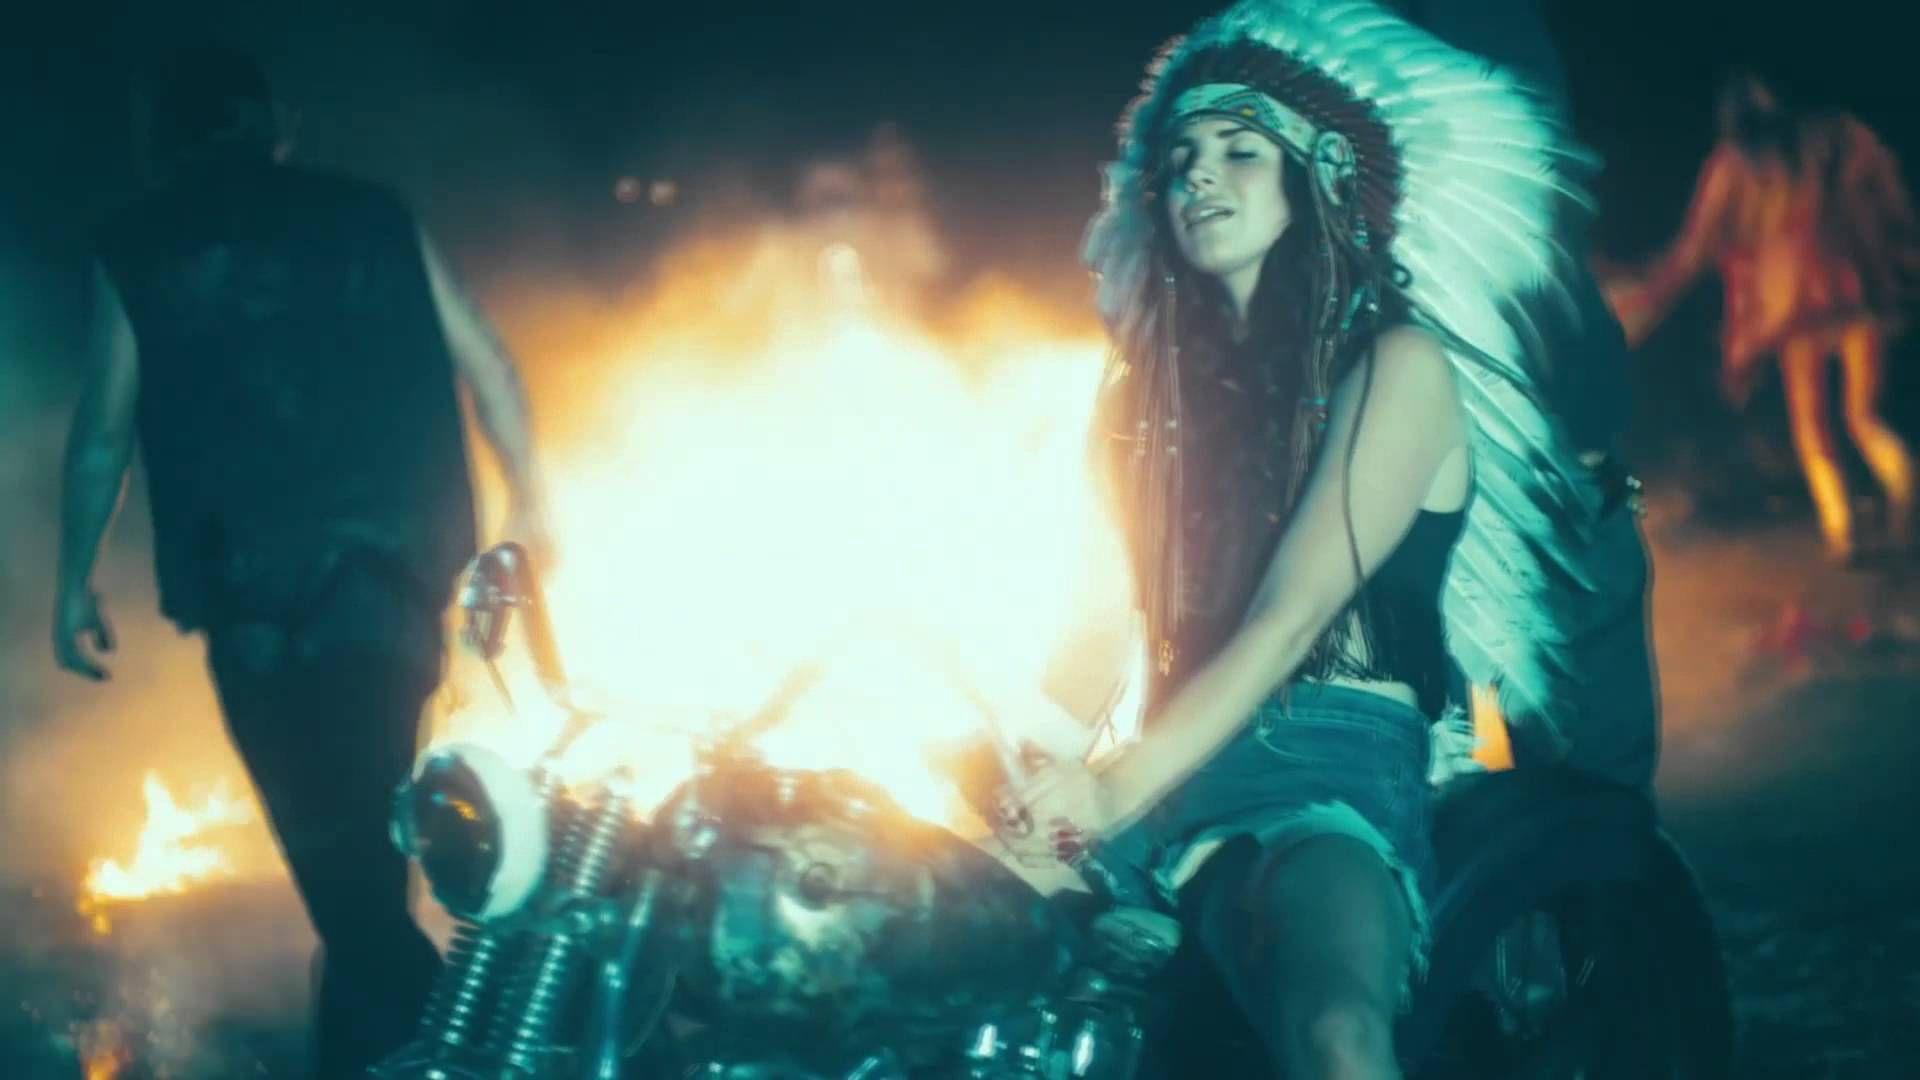 Lana Del Rey Ride Photek Remix Matt Nevin Video Edit Lana